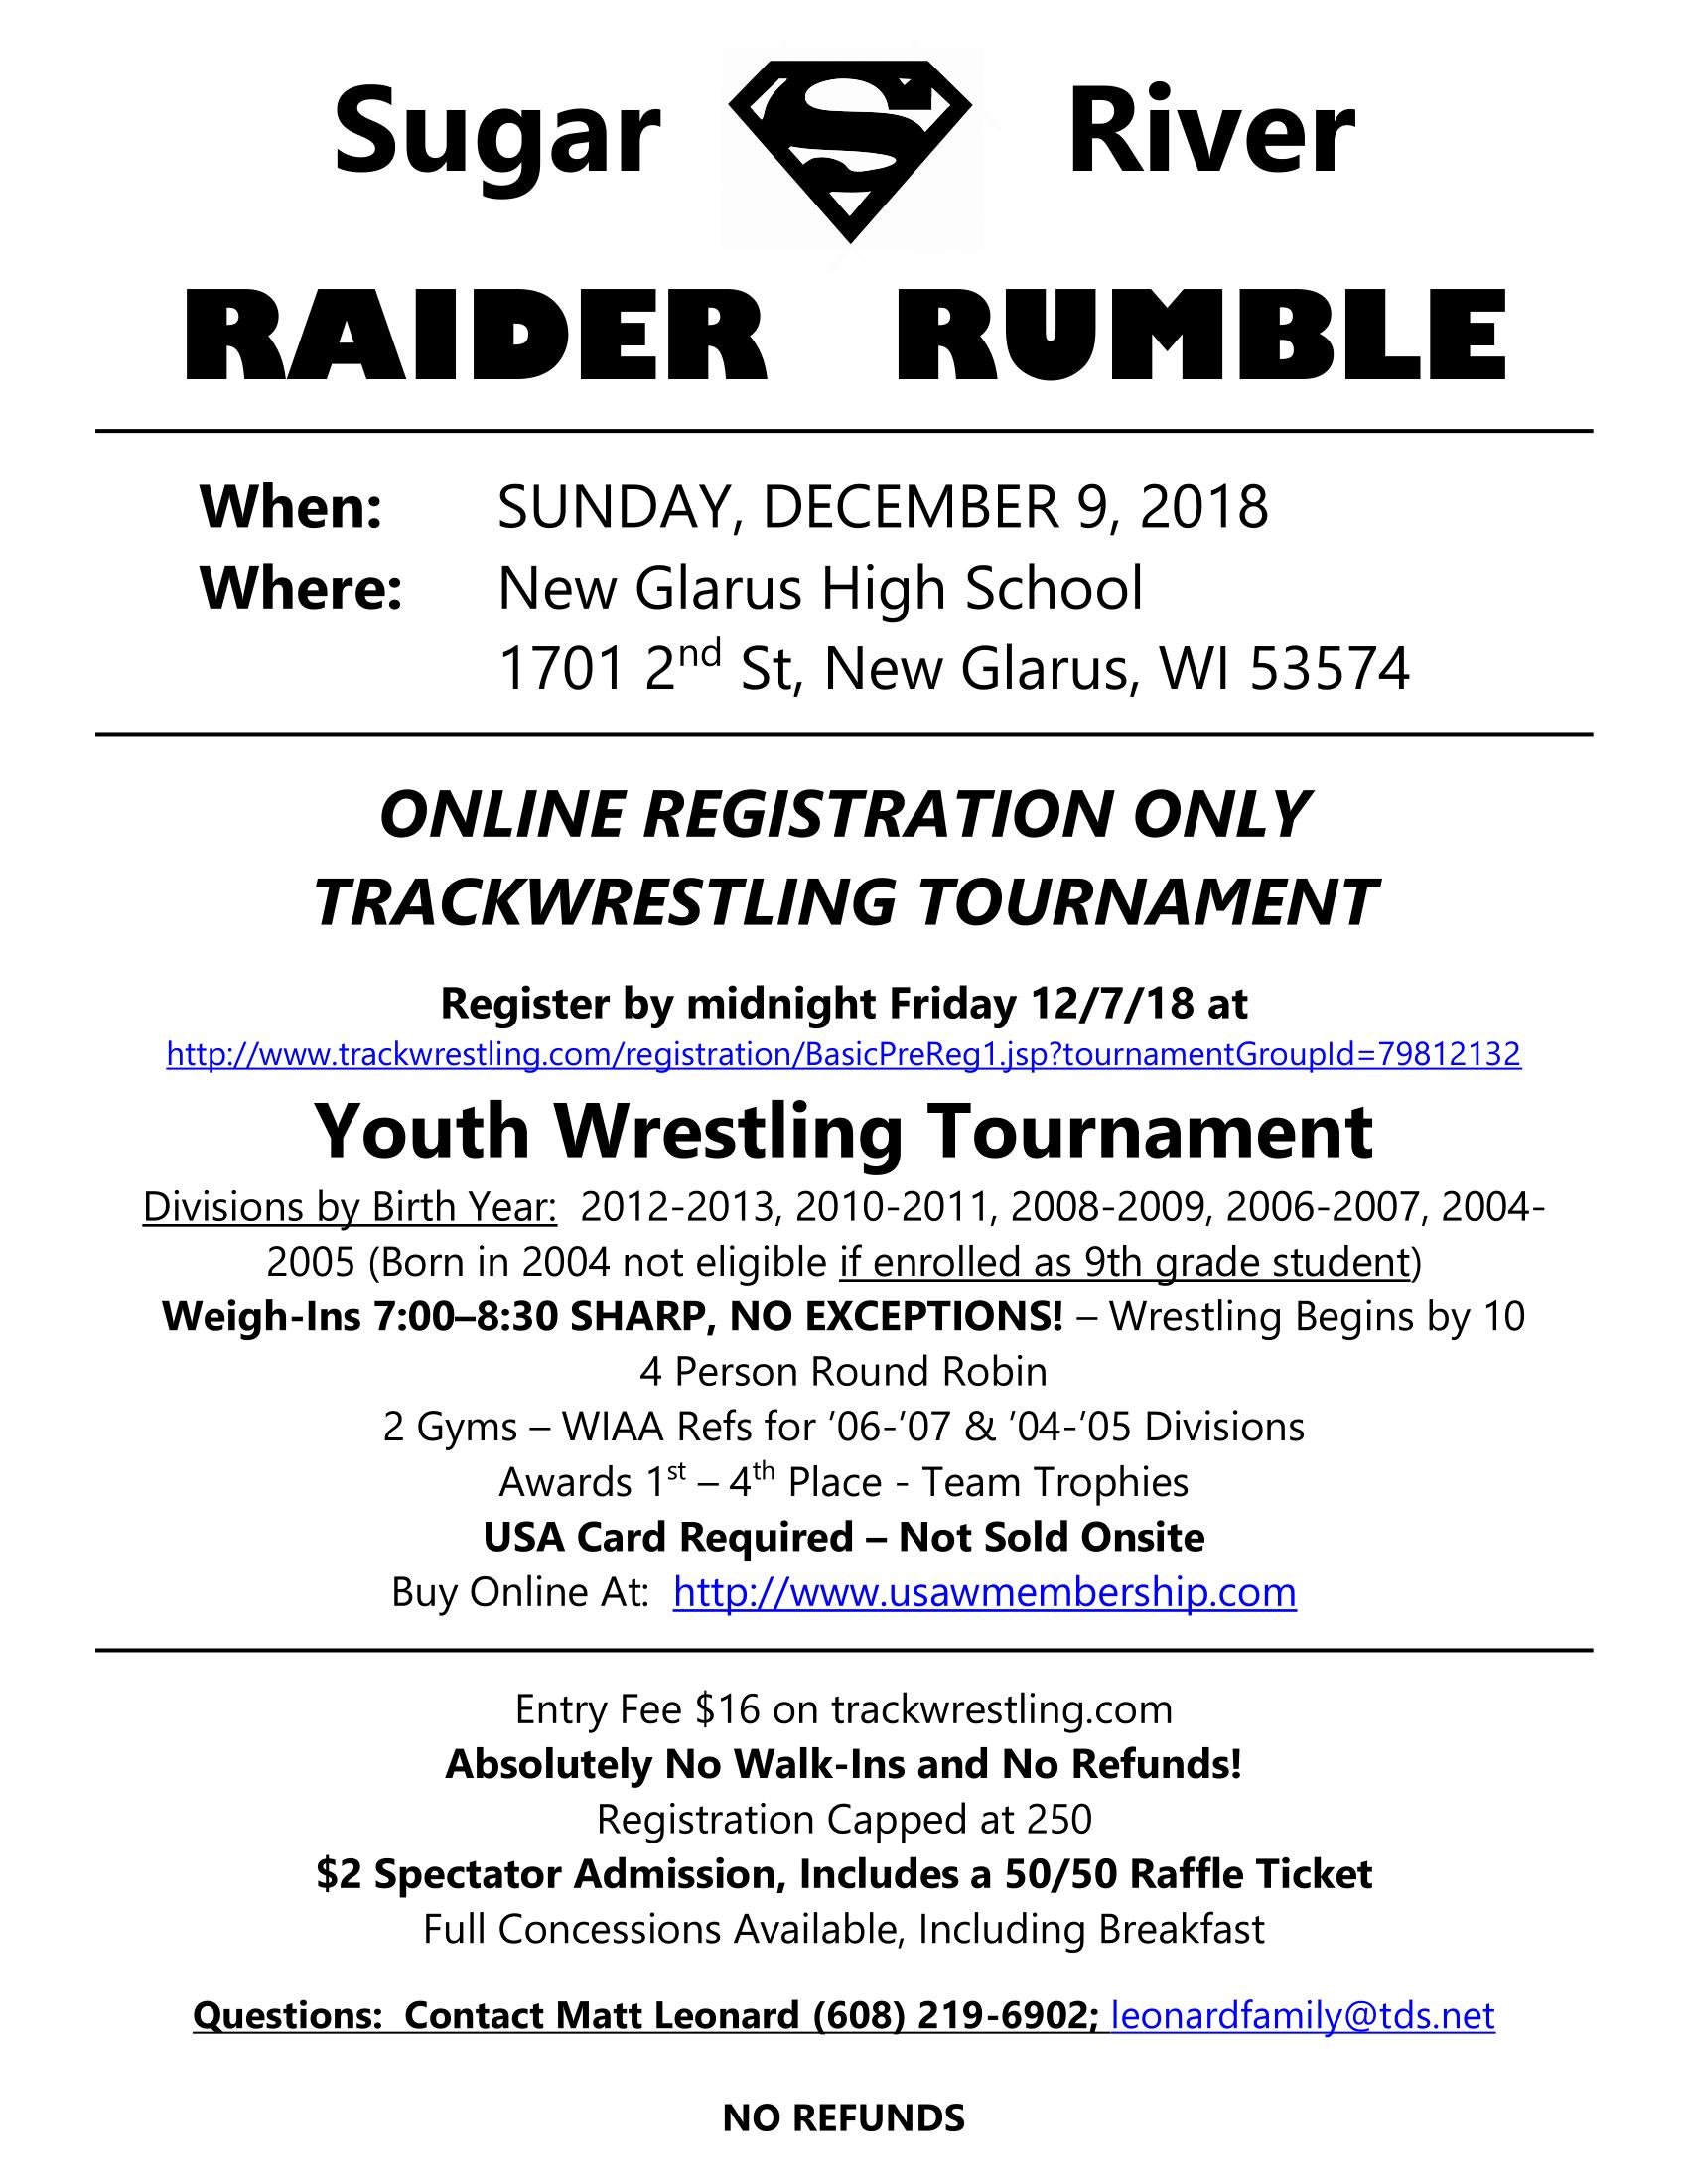 Sugar River Raider Rumble 2018 Flyer(1)-1.png